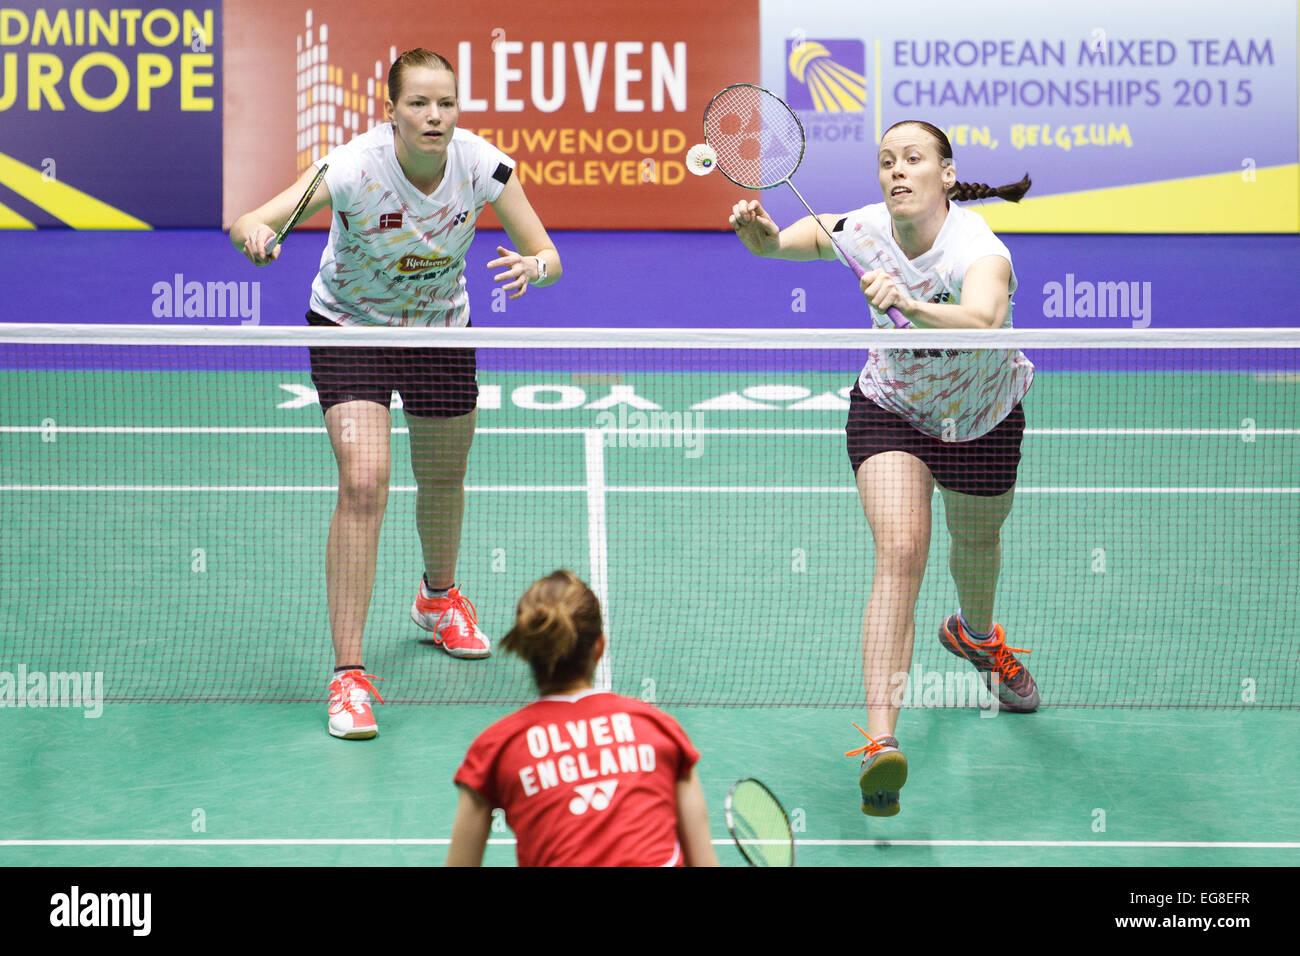 LEUVEN BELGIUM 15 02 2015 Badminton players Christinna Pedersen